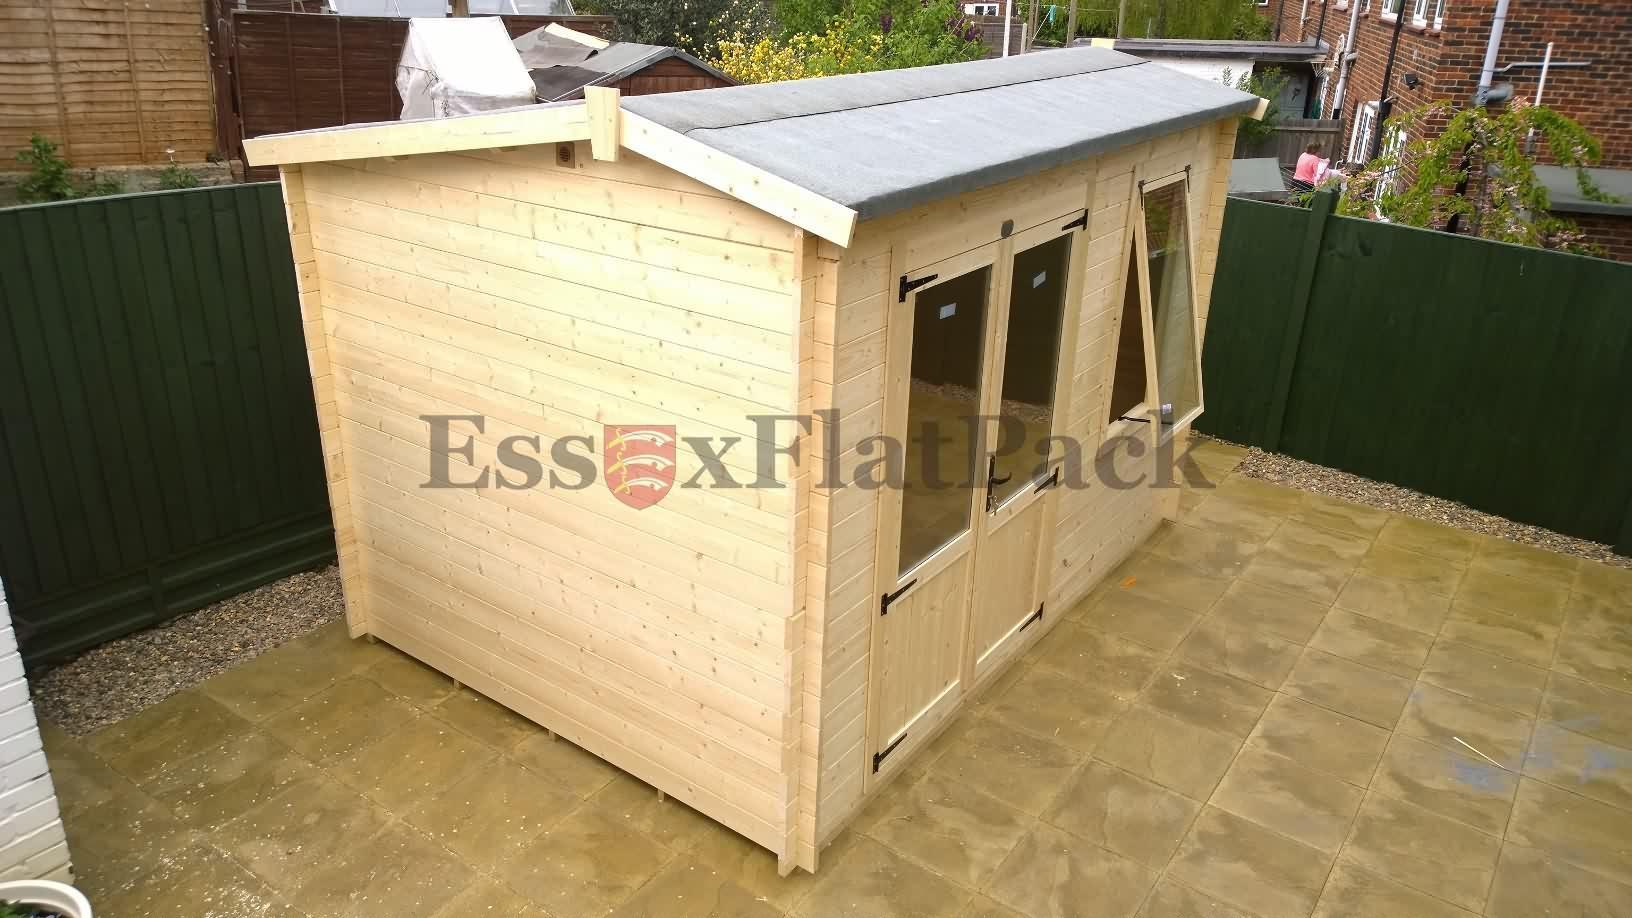 essexflatpack-log-cabins-20170420154305.jpg